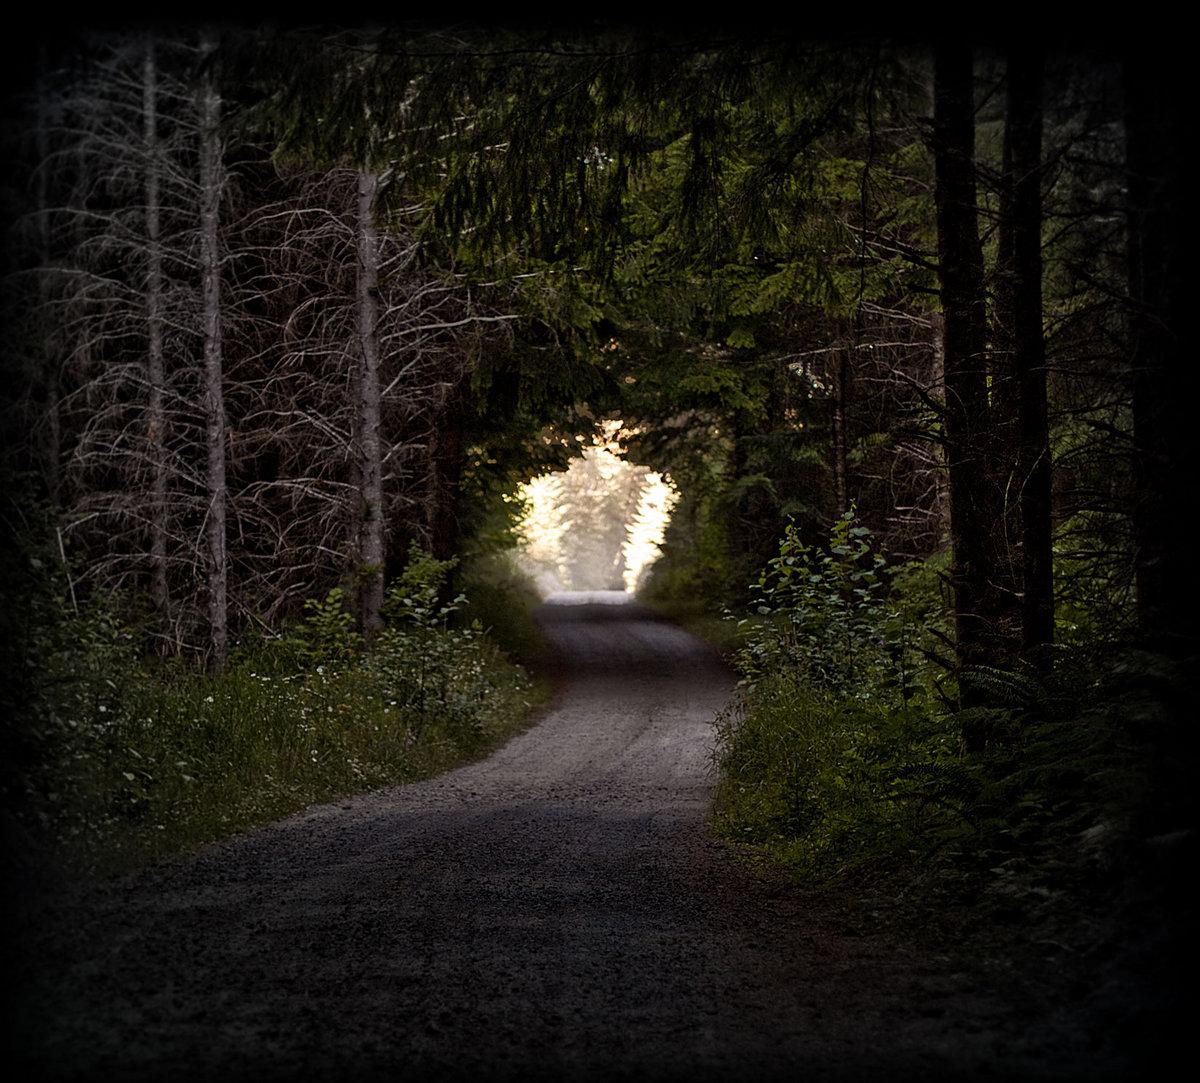 Captivating Love As A Dark Hallway